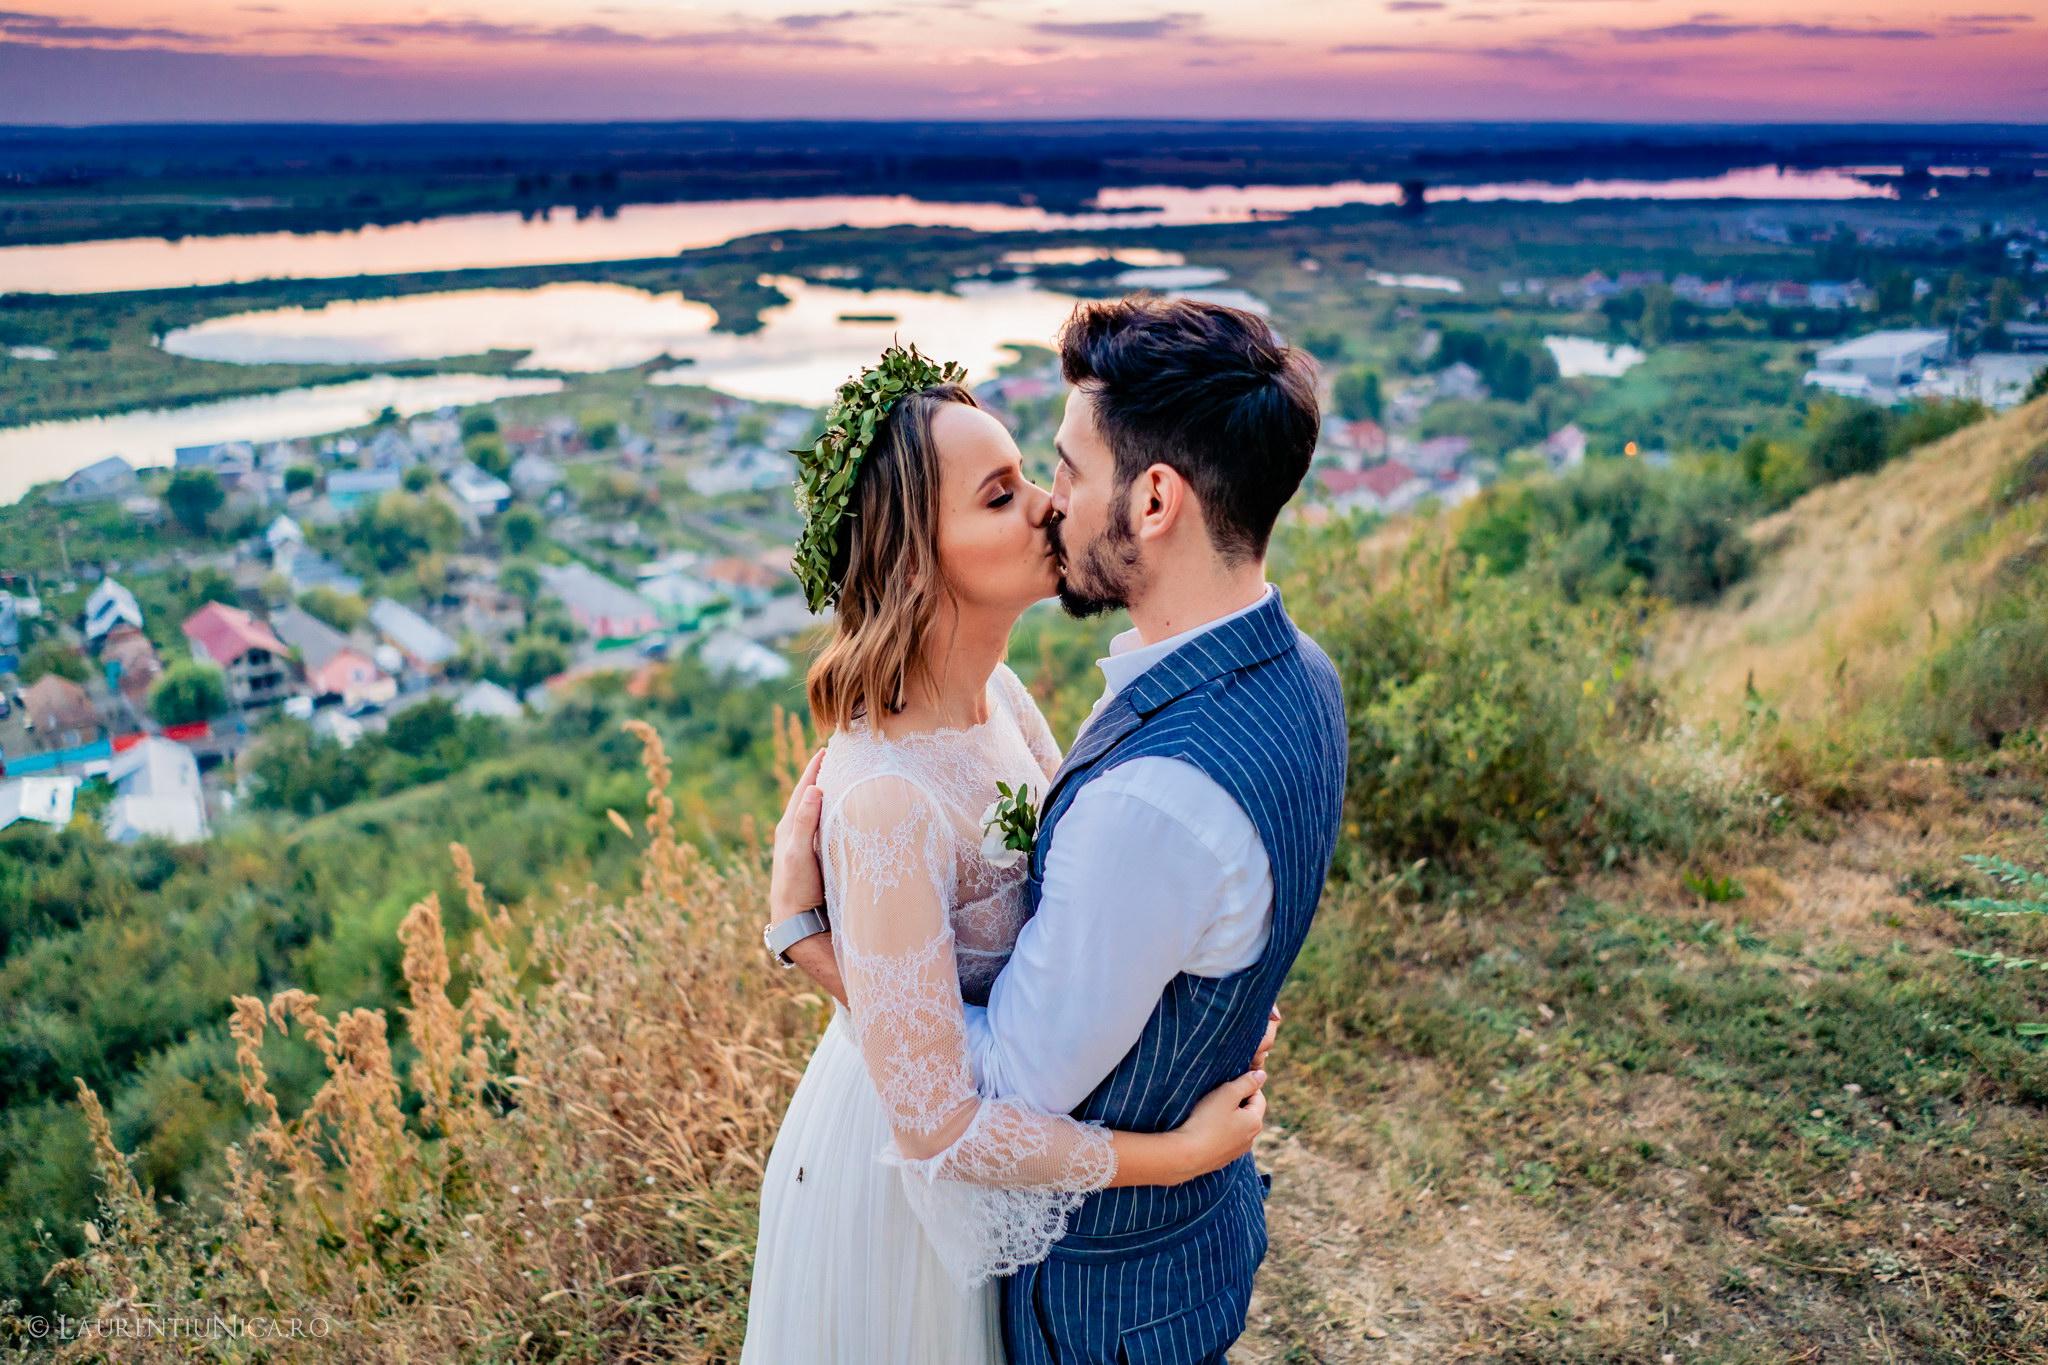 20180915 LN 0690 - Diana & Marius | Fotografii nunta | Slatina